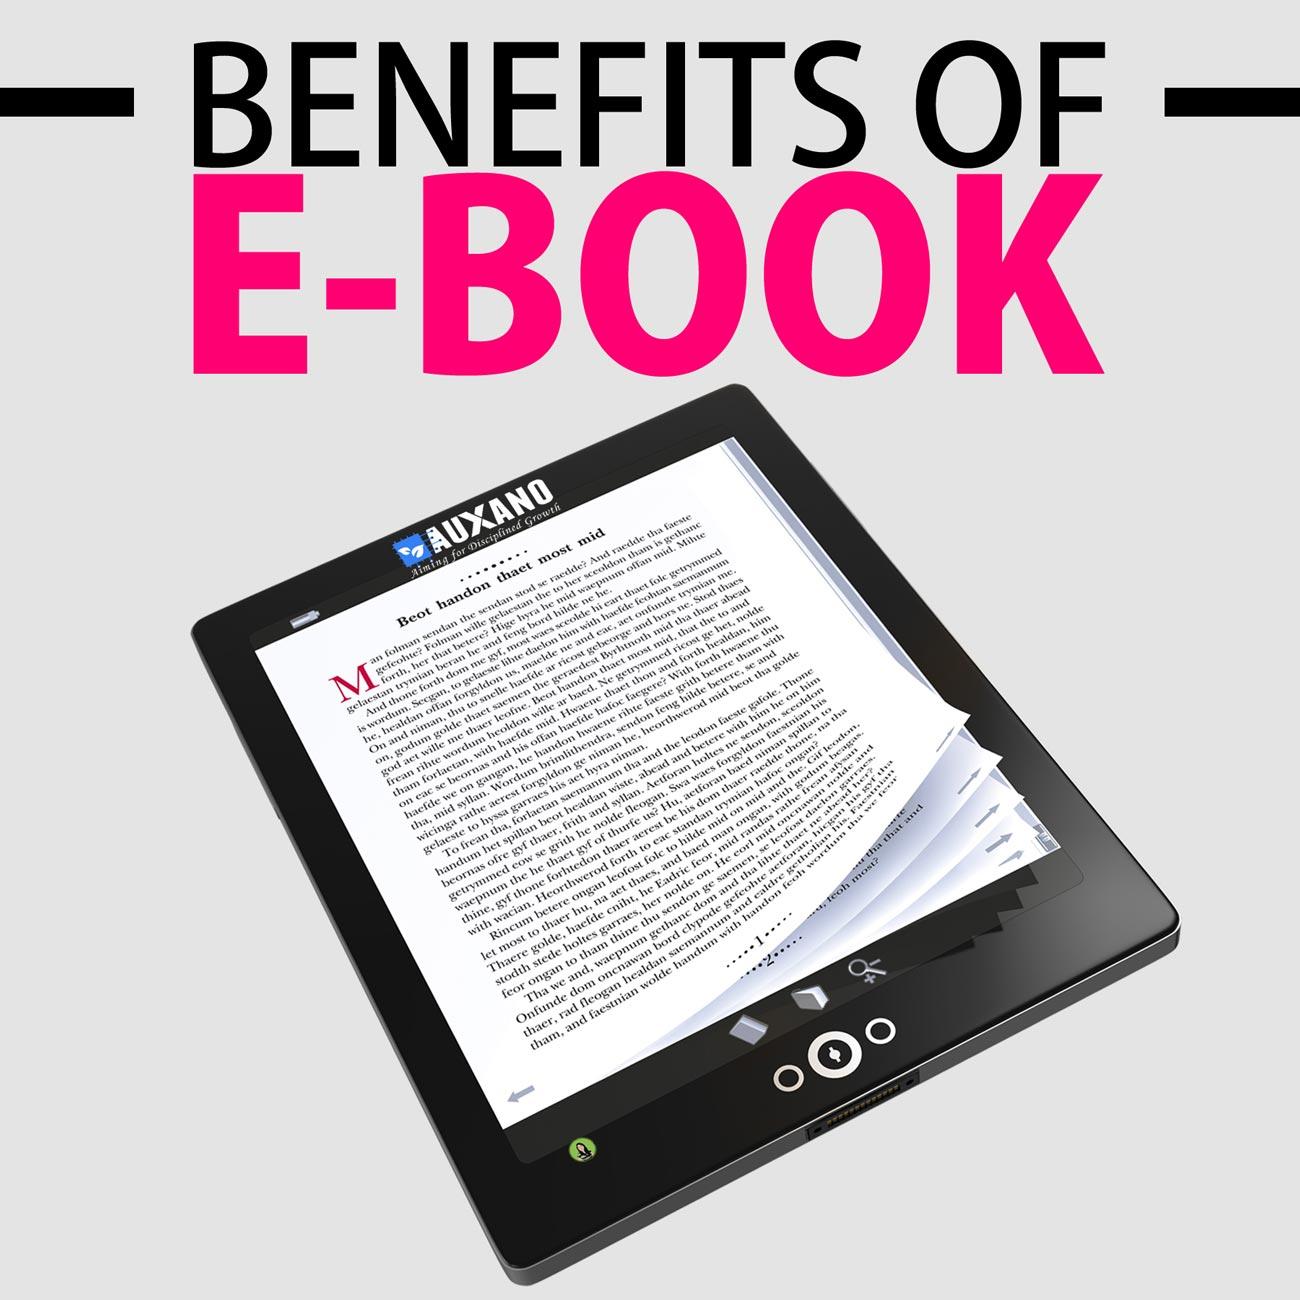 lợi ích của ebook